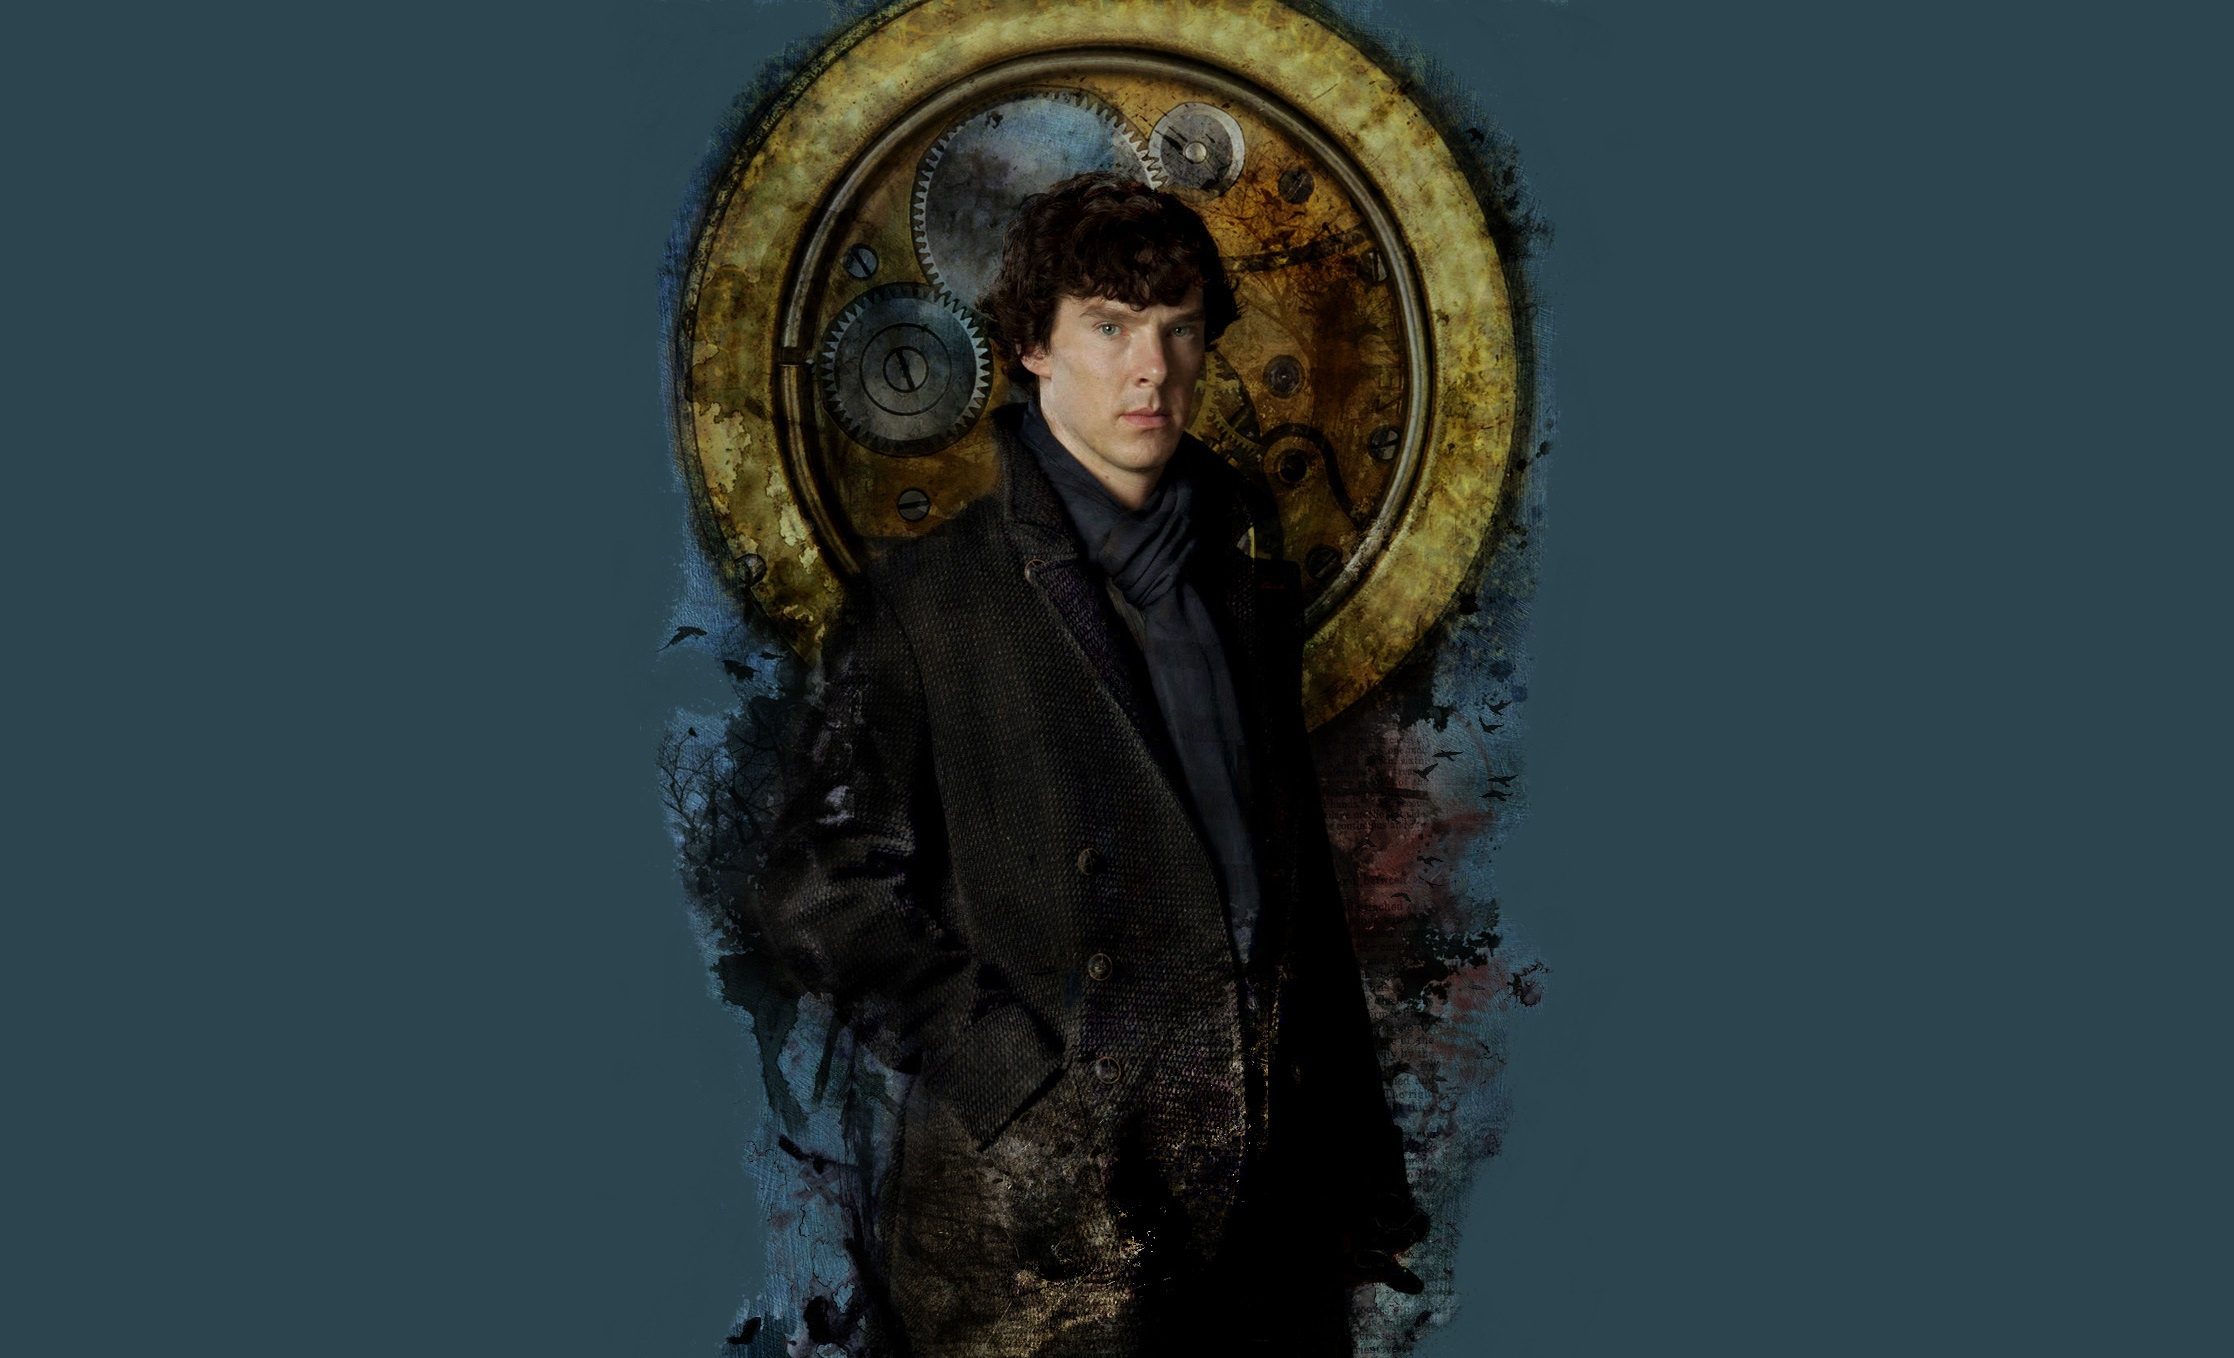 Шерлок холмс картинки на обои